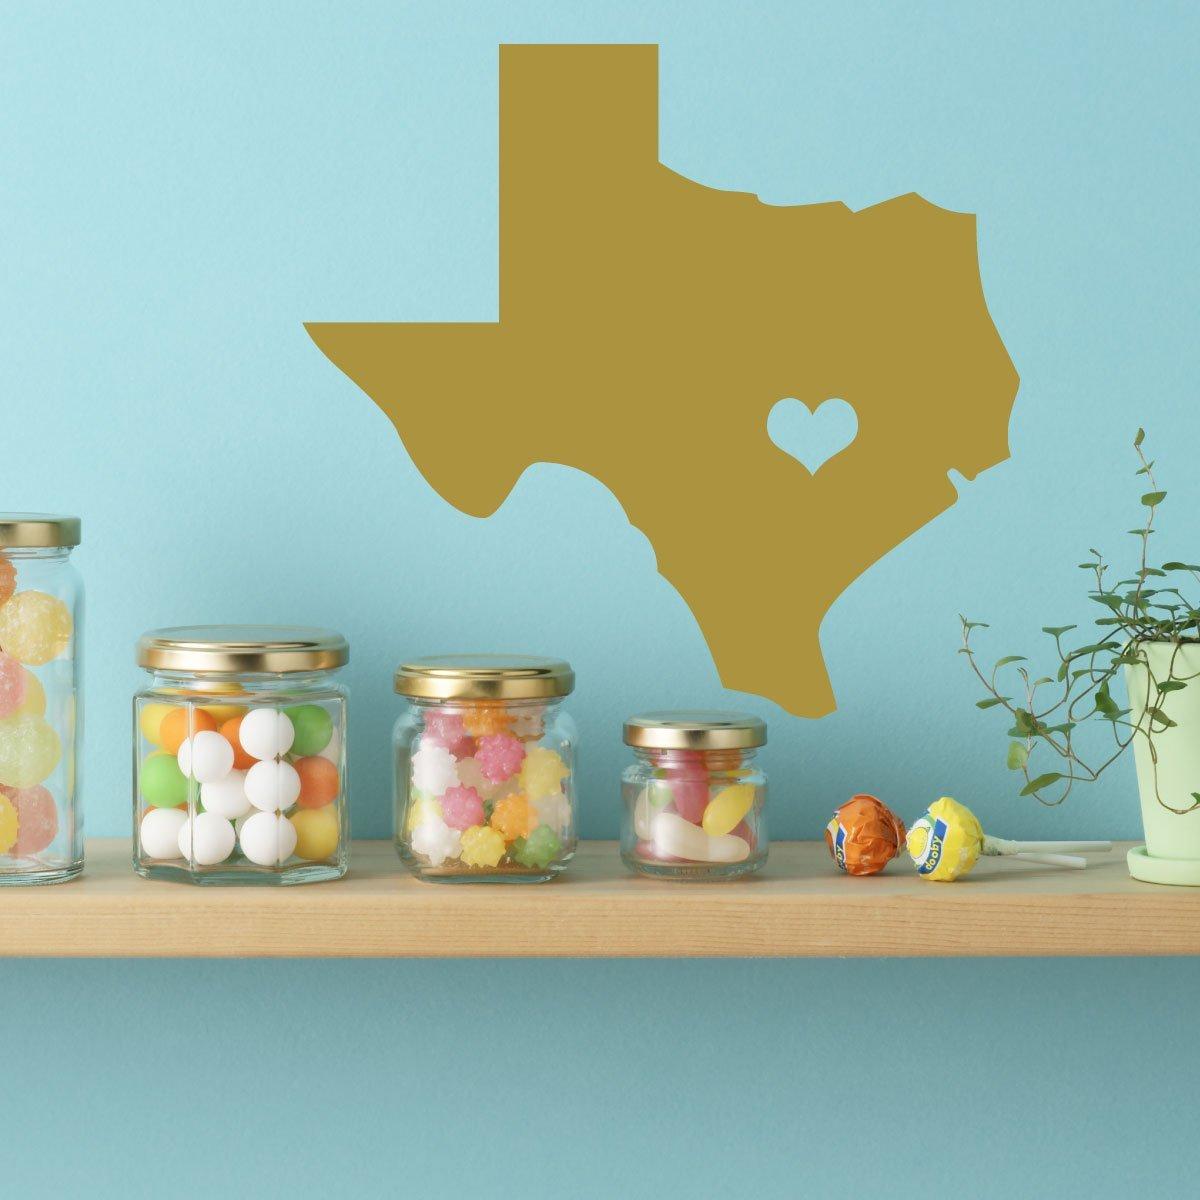 Amazon.com: Texas Wall Decal - I Love Texas Home Decor - The Lone ...